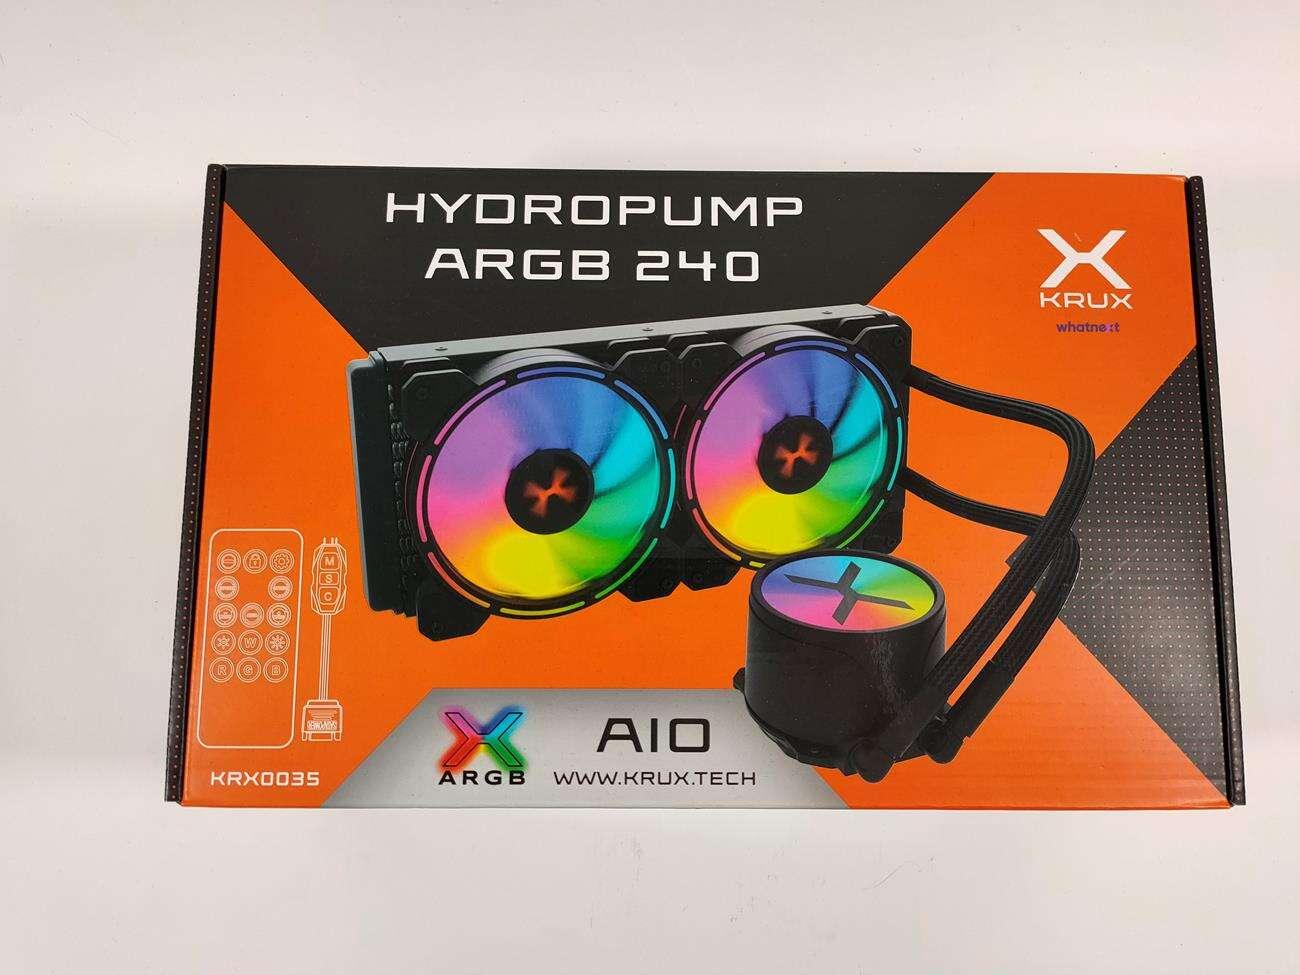 test Krux HydroPump ARGB 240, recenzja Krux HydroPump ARGB 240, opinia Krux HydroPump ARGB 240